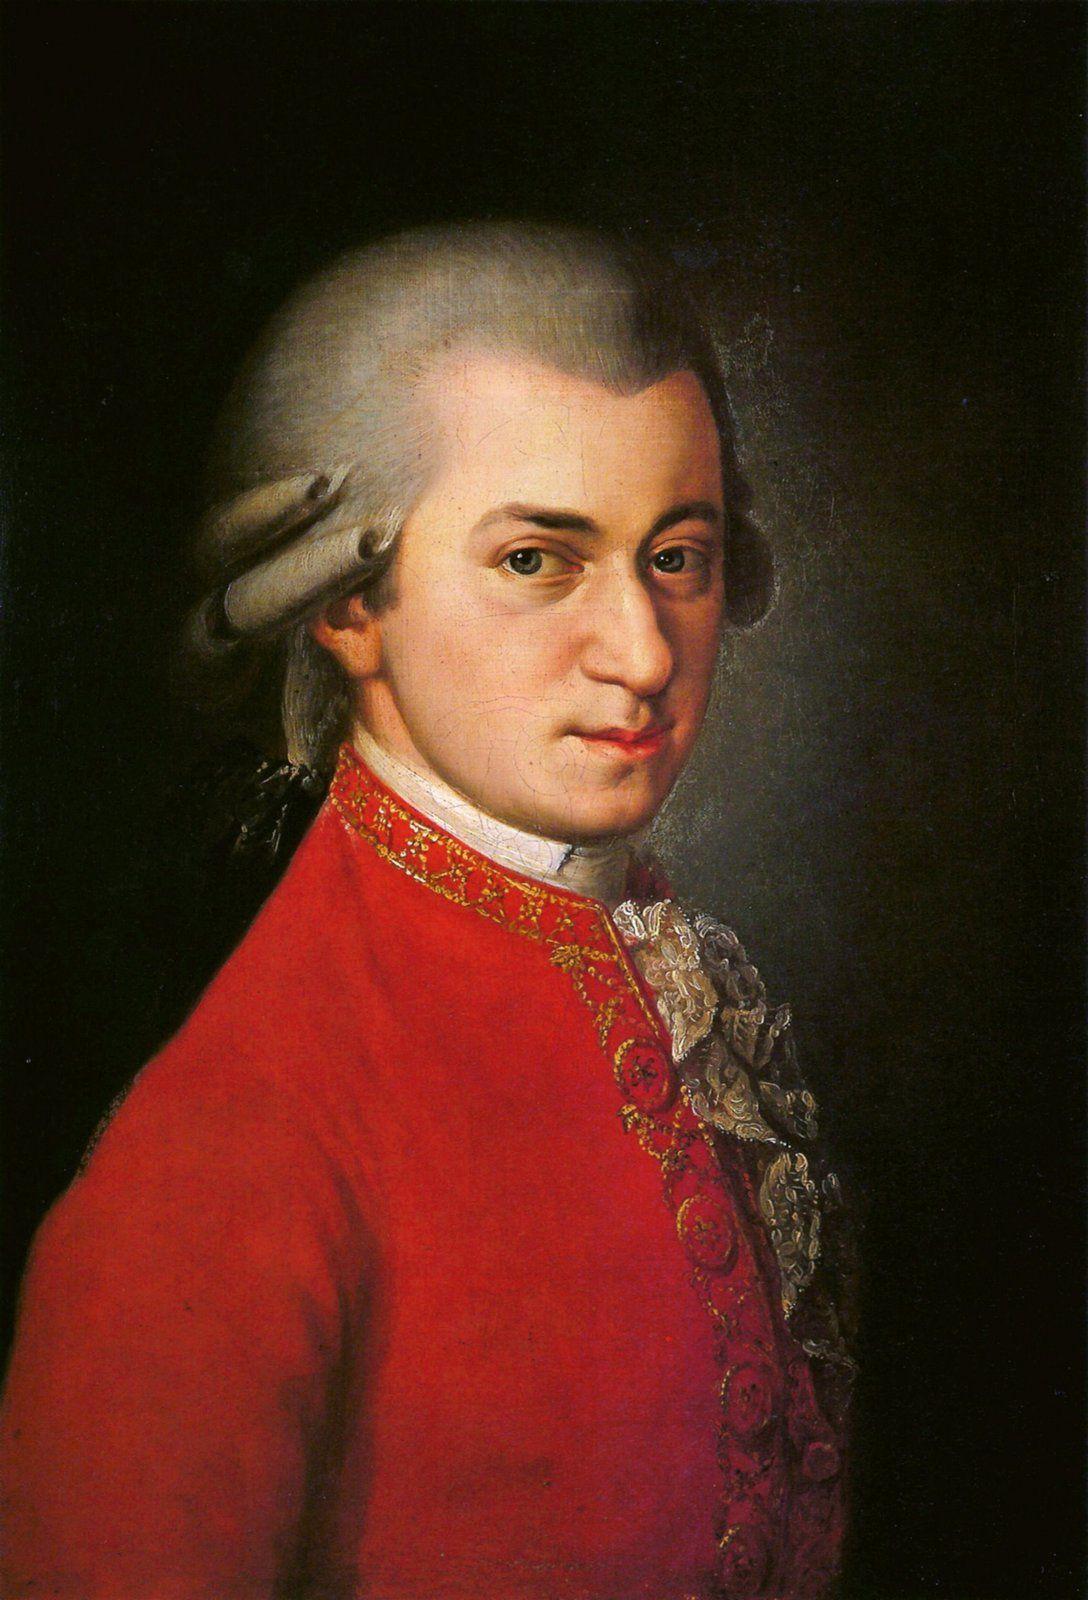 Wolfgang Amadeus Mozart / MUSIQUE